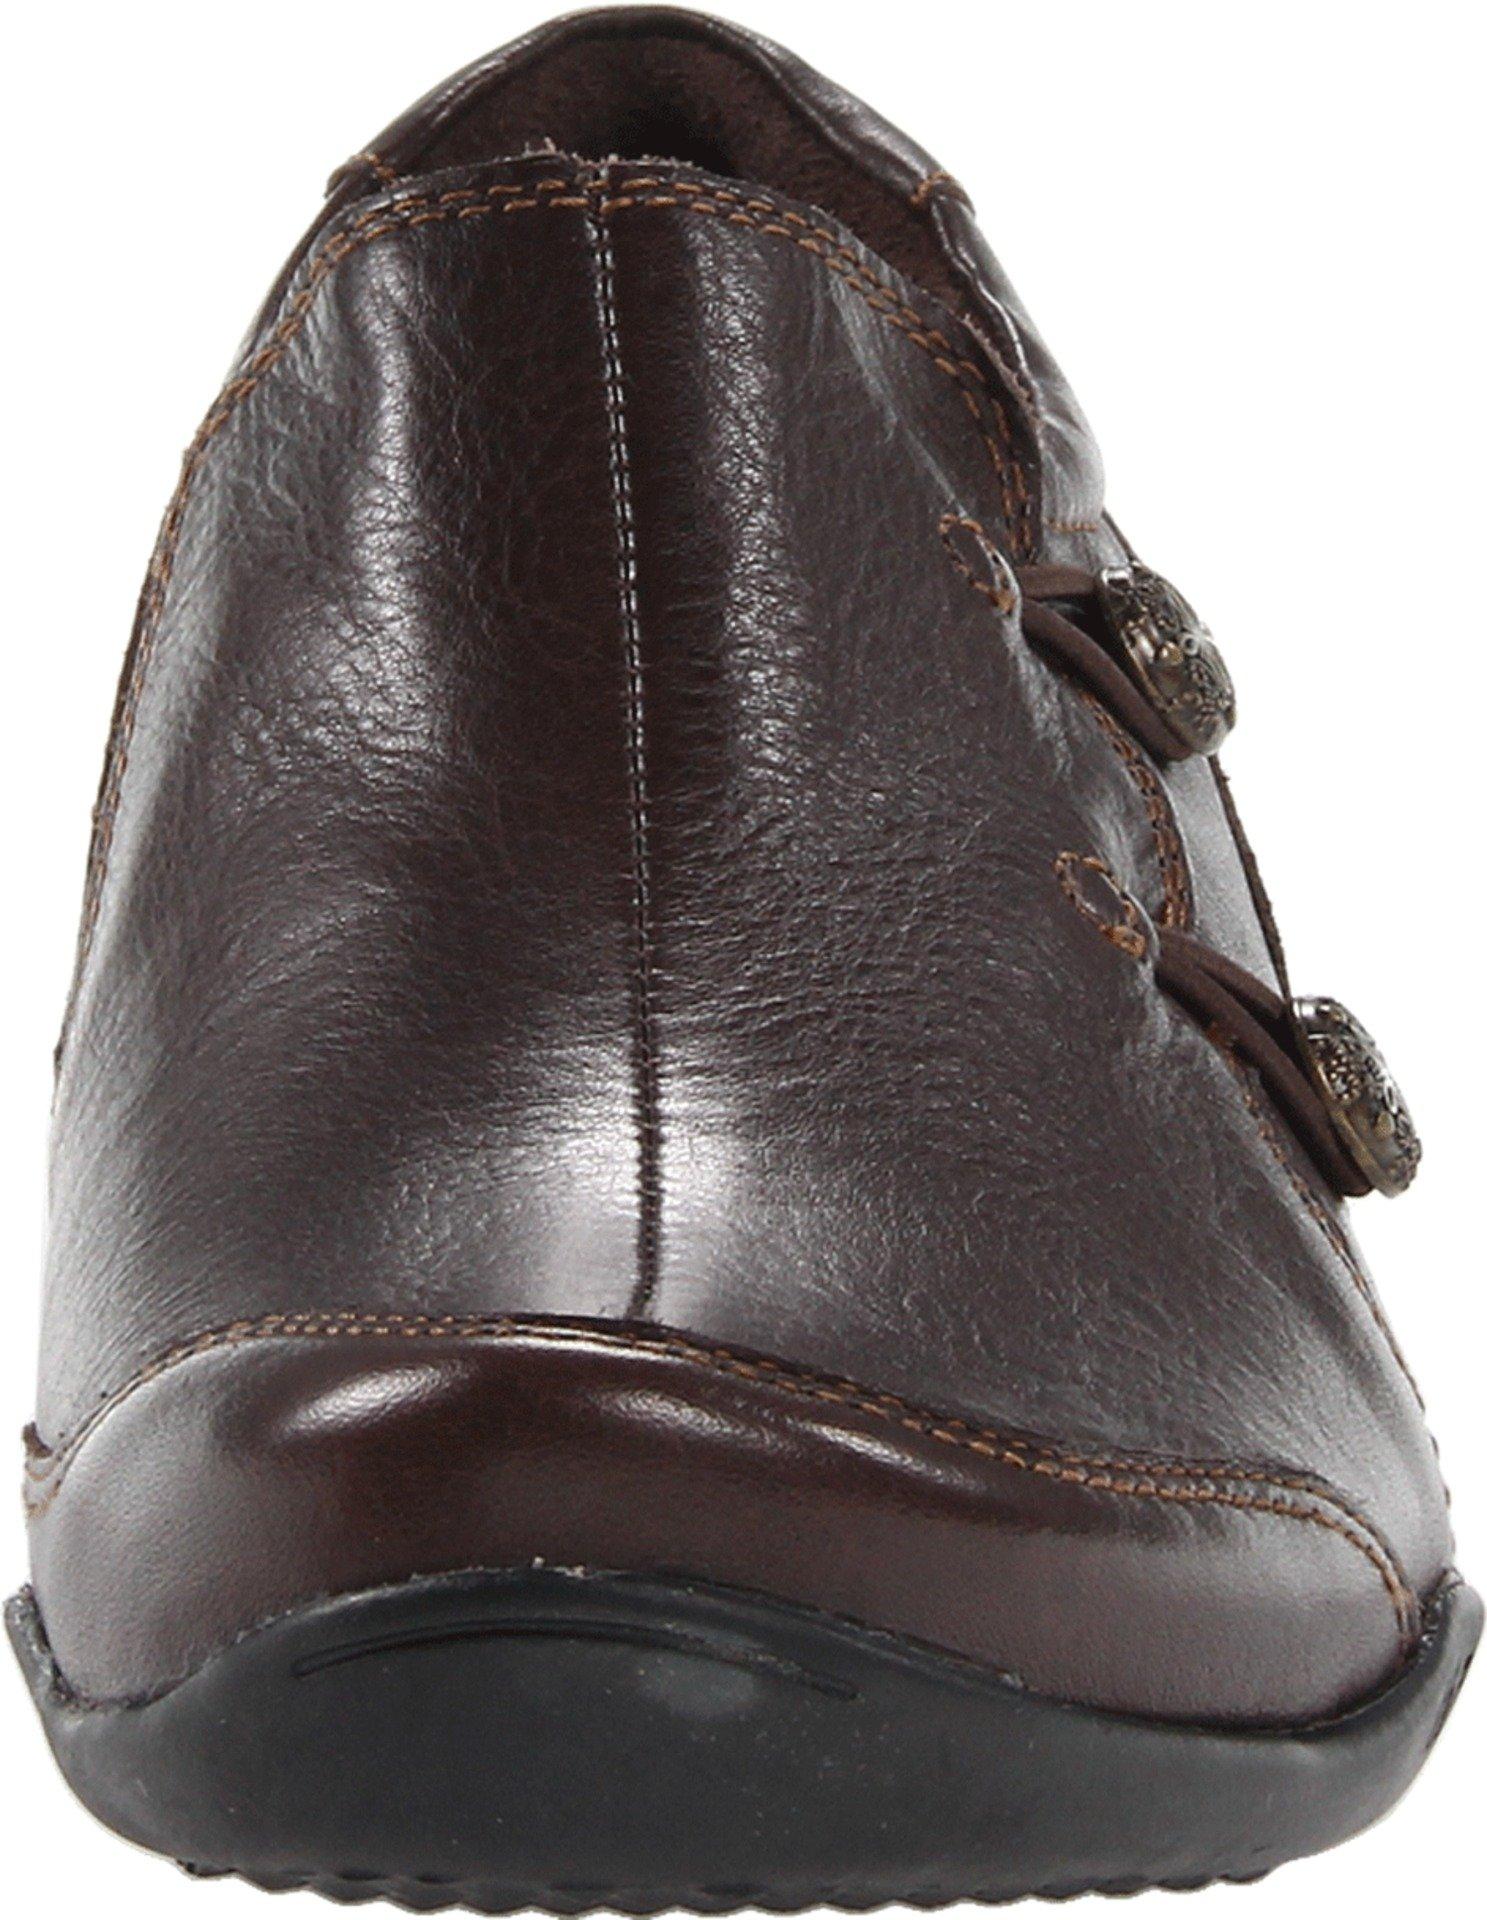 Taos Women's Encore Flat,Chocolate,7 M US by Taos Footwear (Image #4)